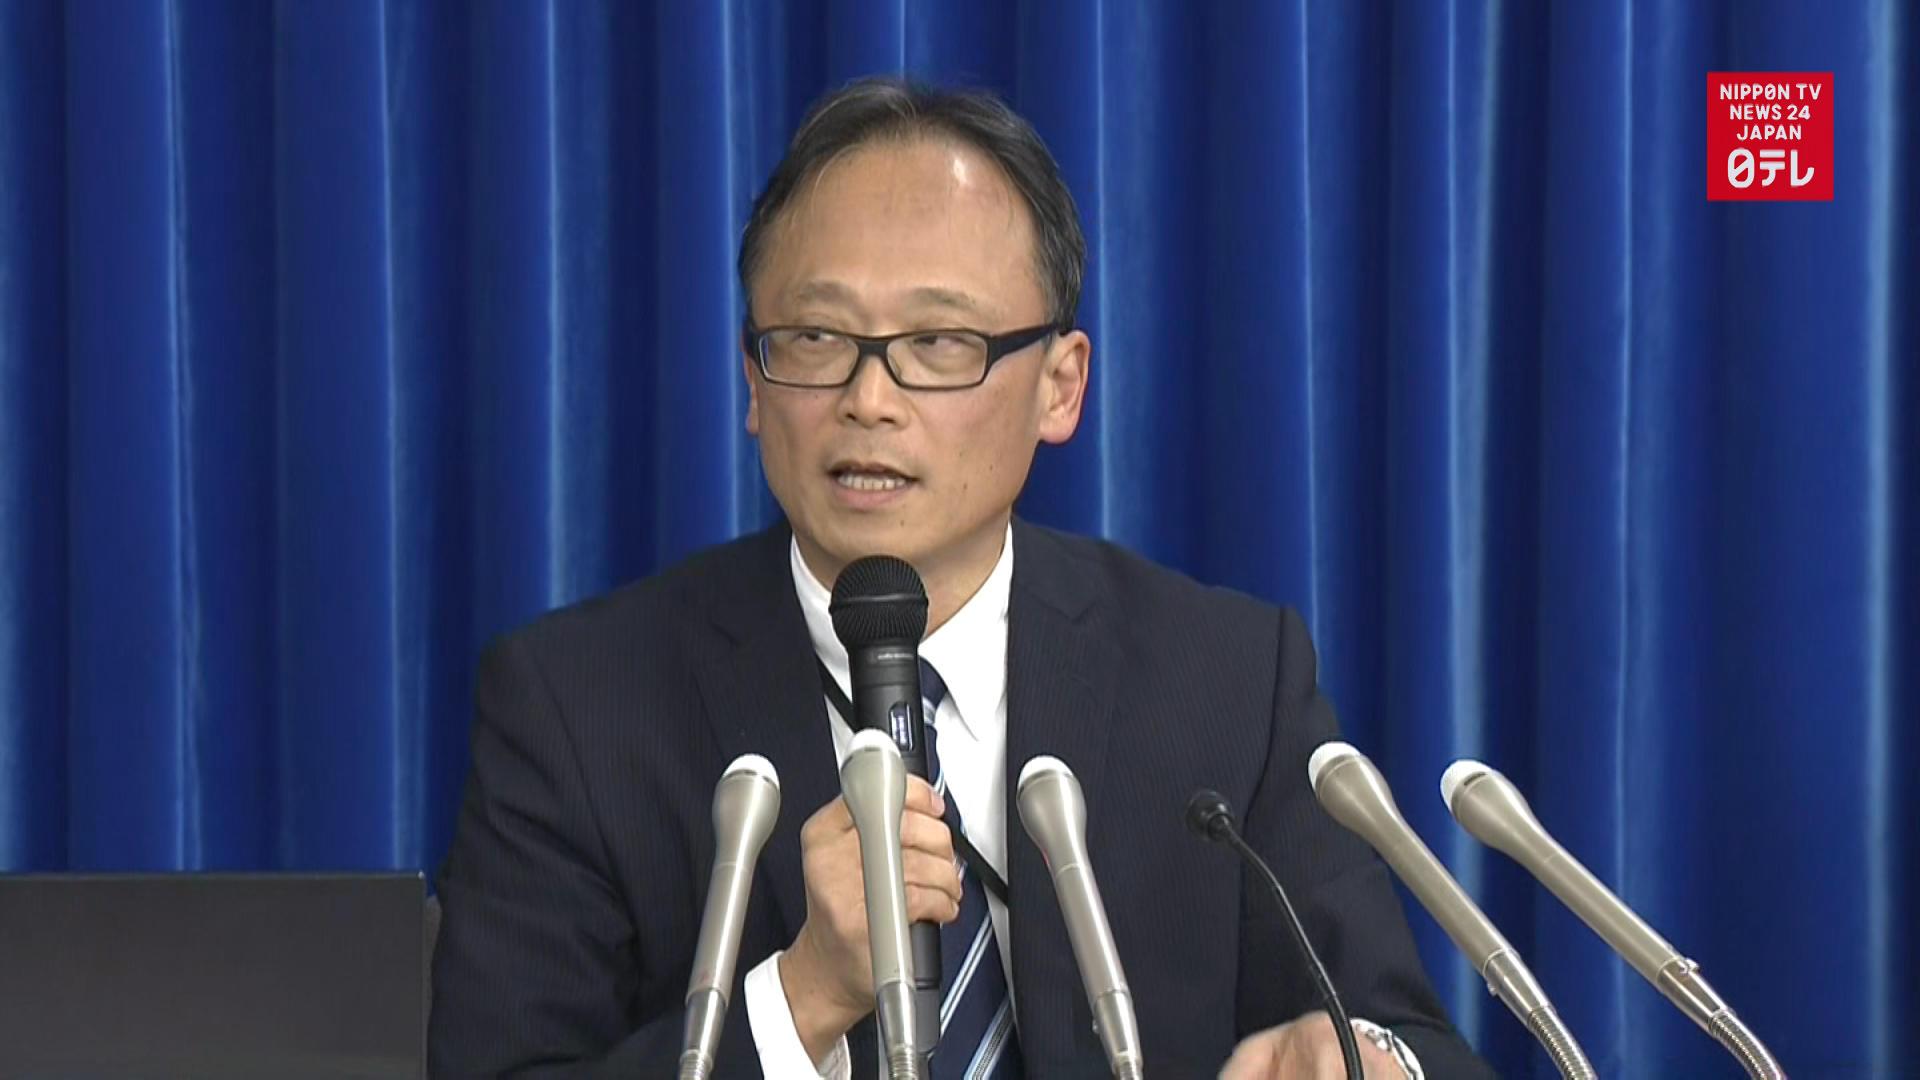 CORONAVIRUS: 3 new cases in Japan, total now 17